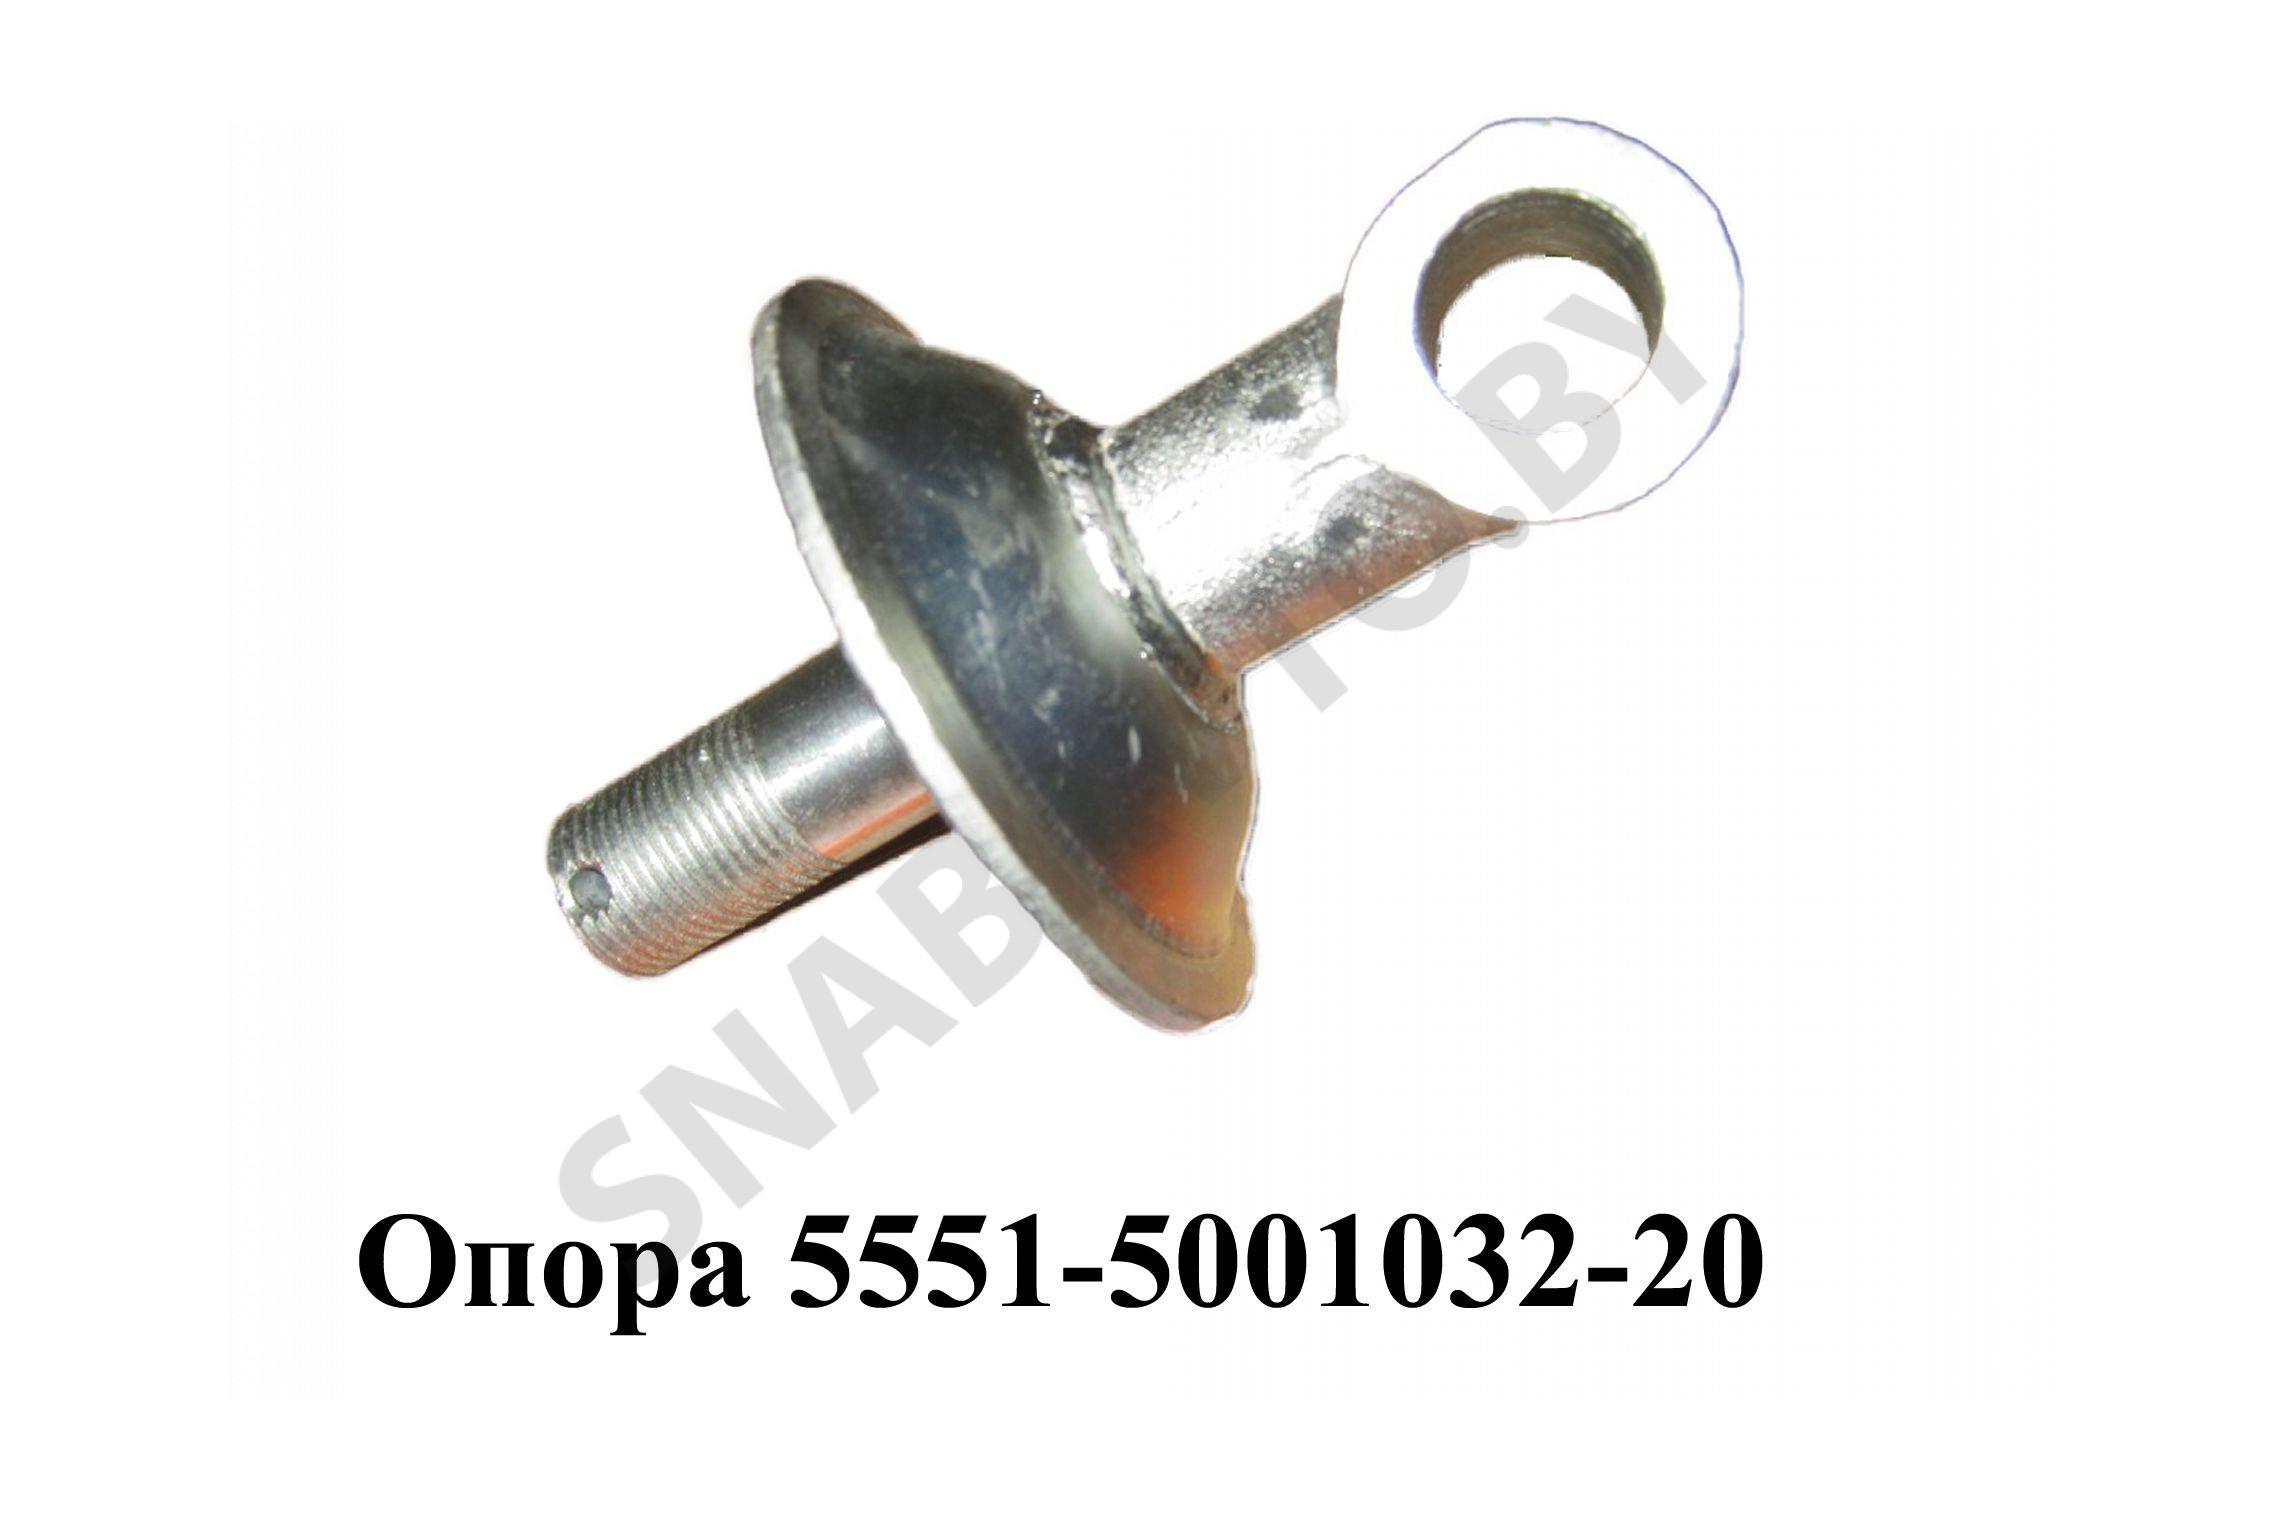 5551-5001032-20